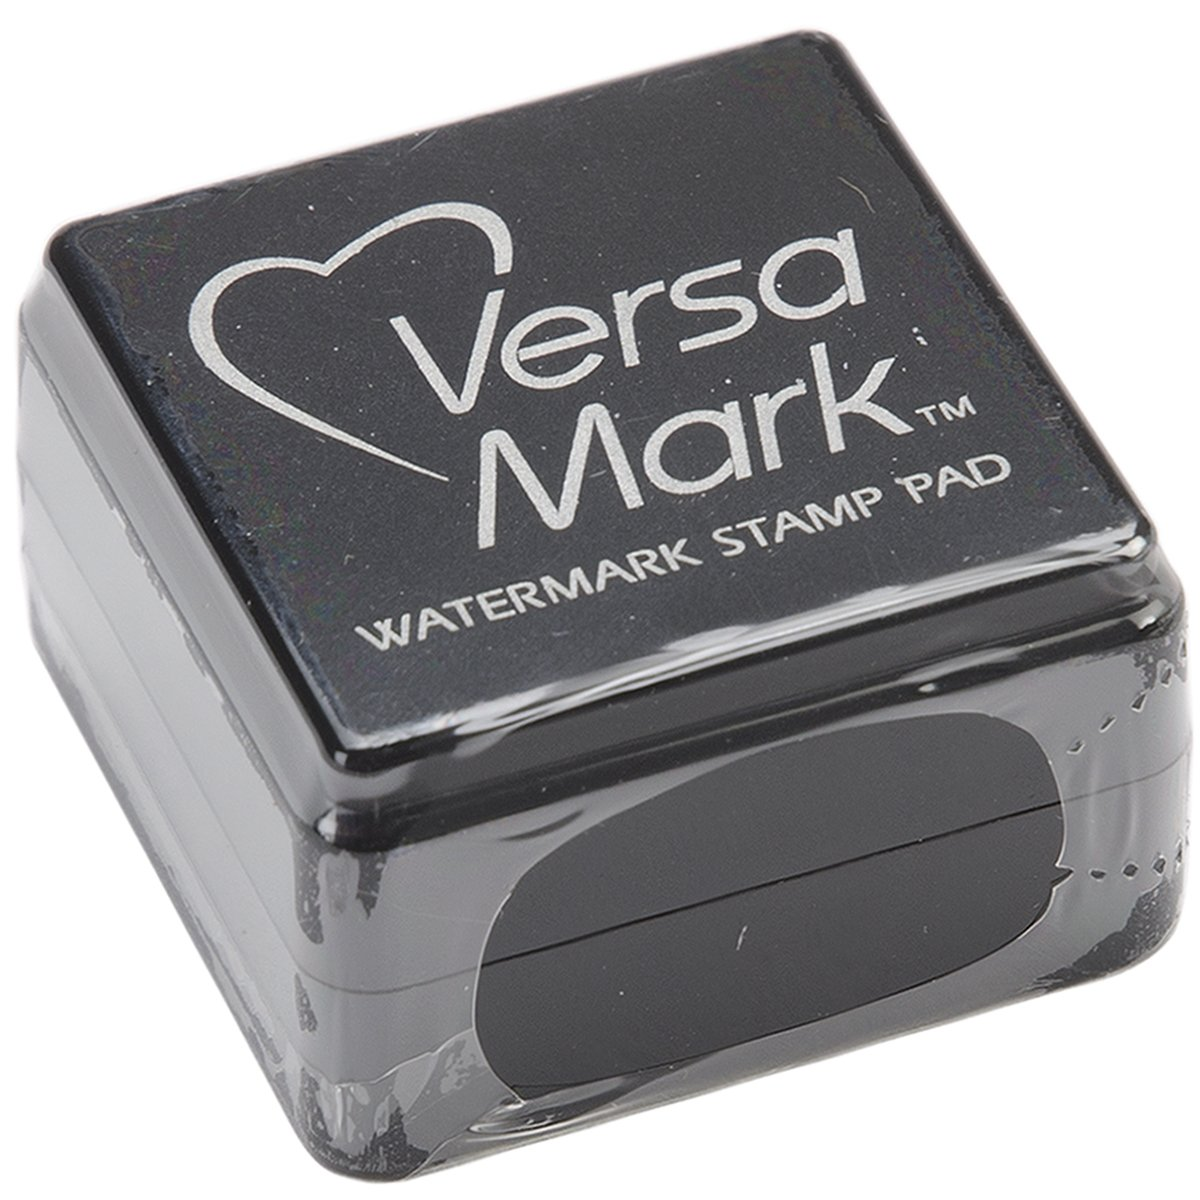 Tsukineko Small-Size VersaMark Pigment Inkpad, Clear